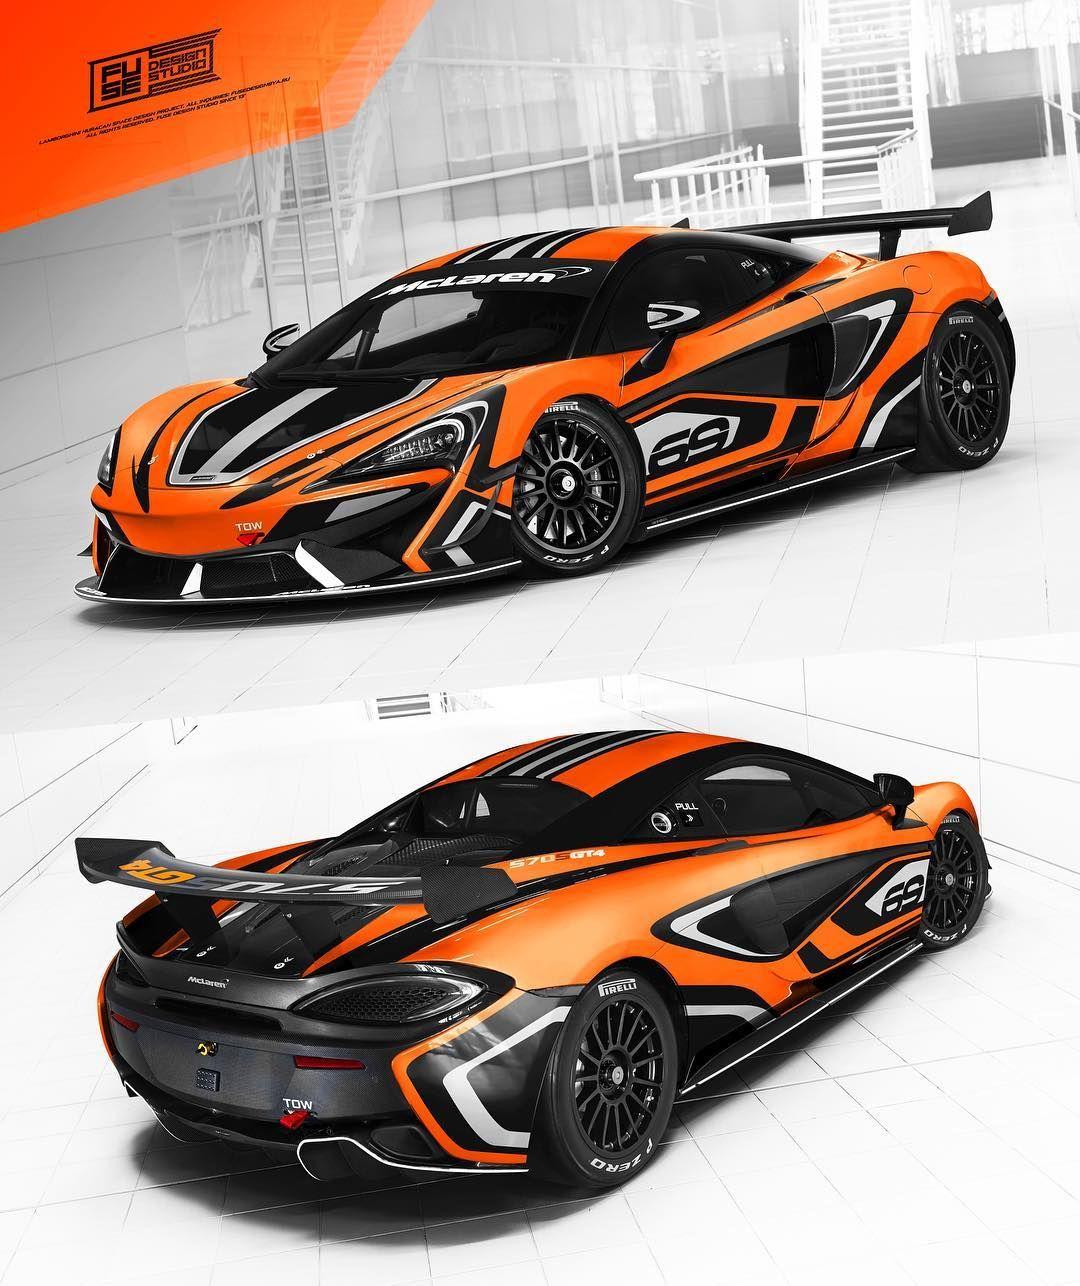 Mclaren 570s Gt4 Livery Style Graphics Design Project Wrap B Racing Car Design Car Wrap Design Car Wrap